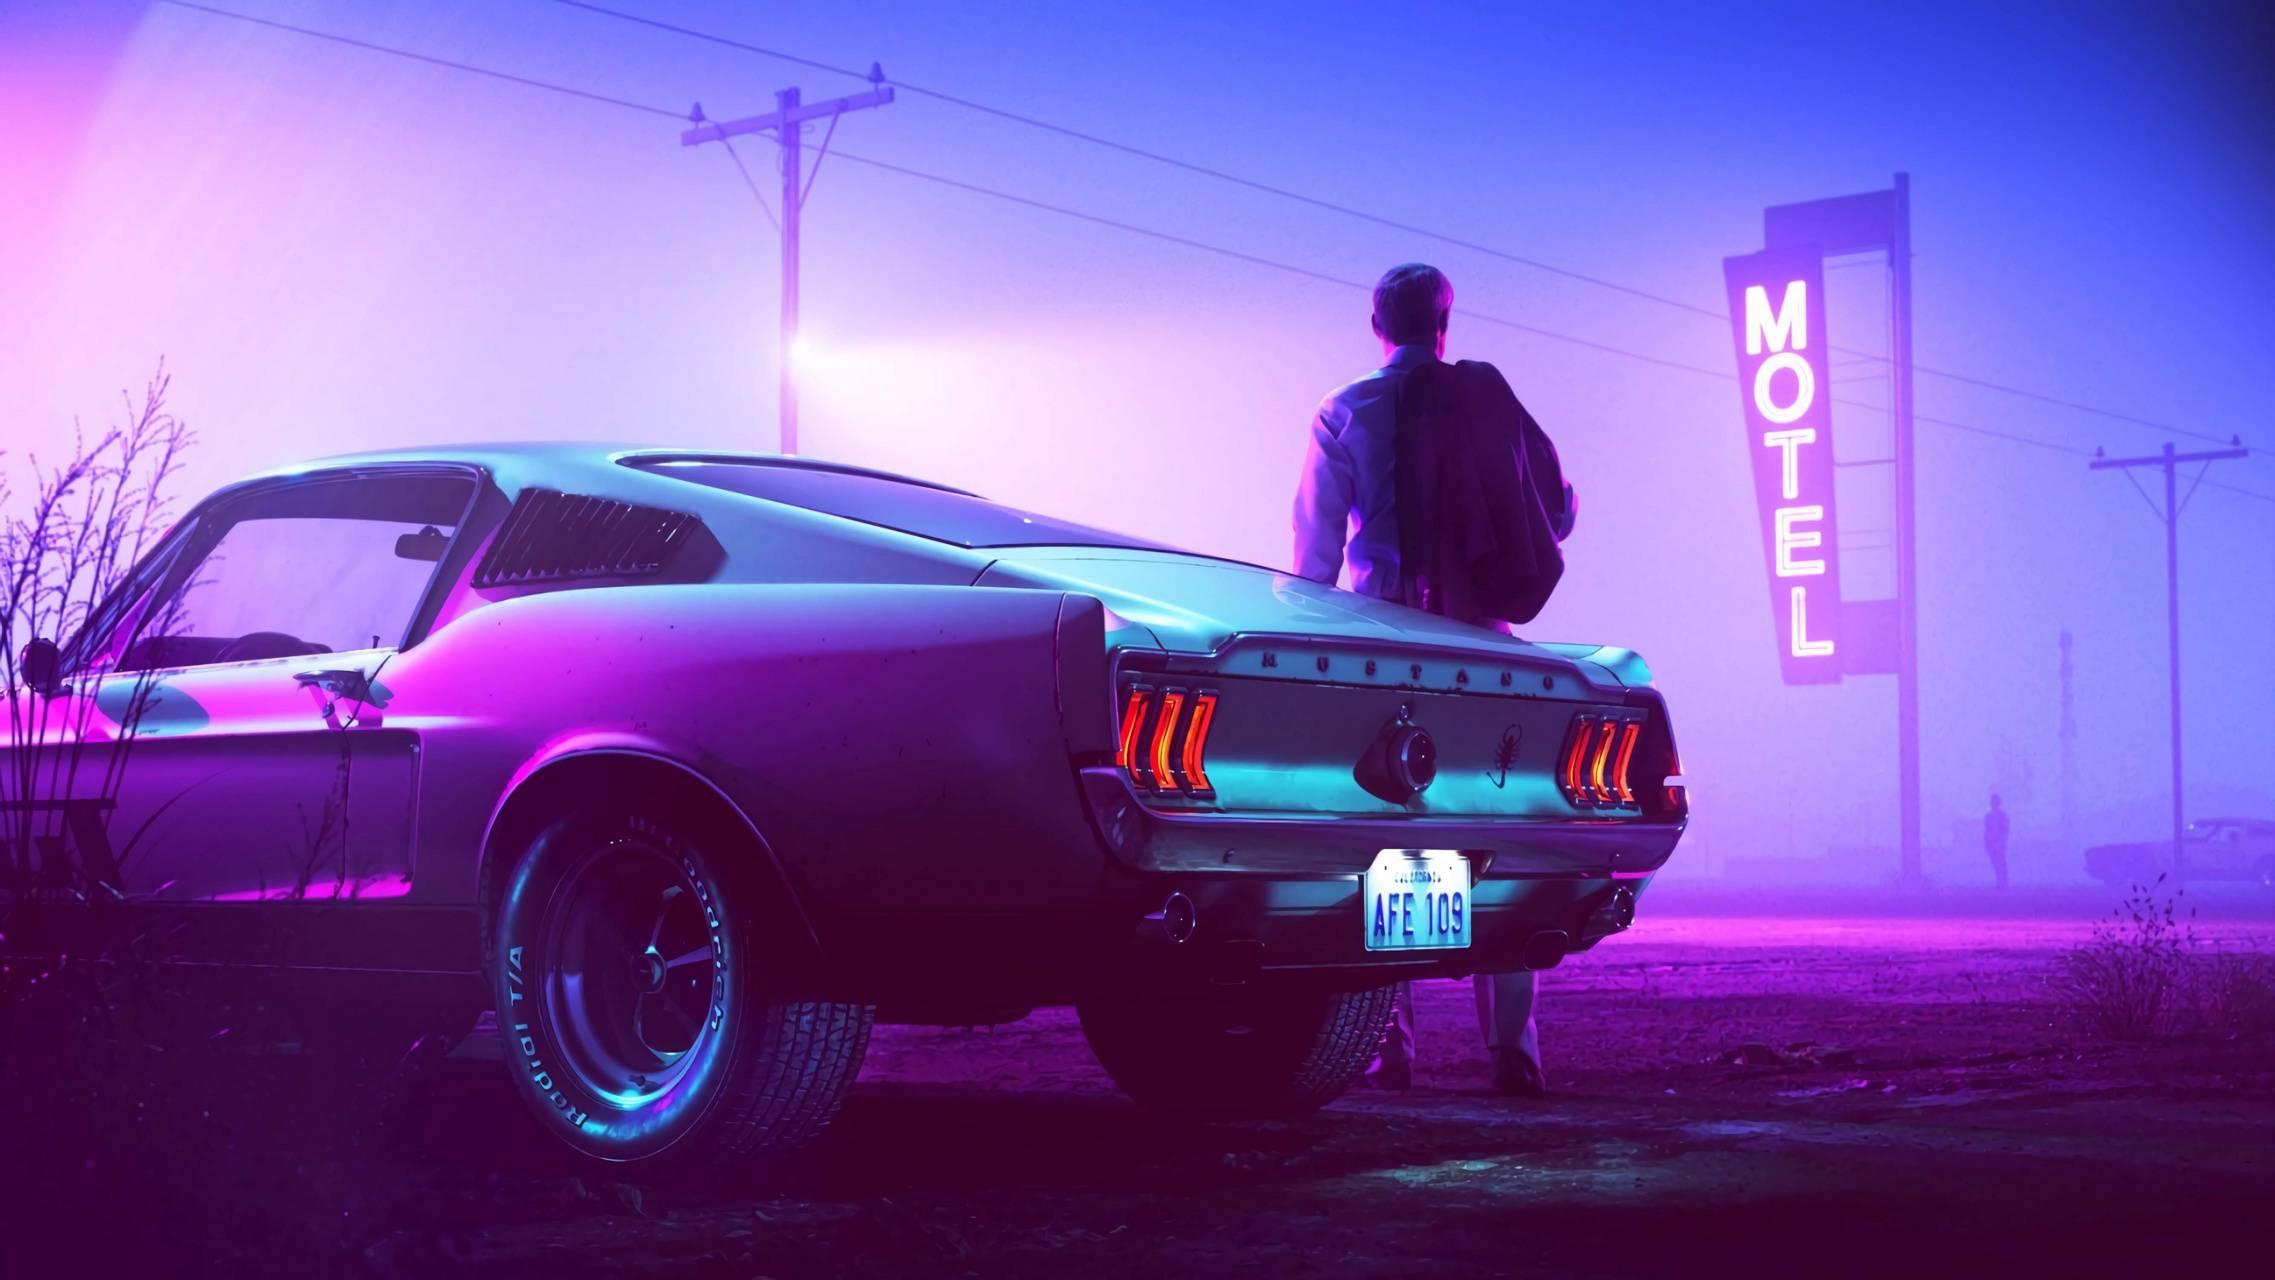 Mustang Colors